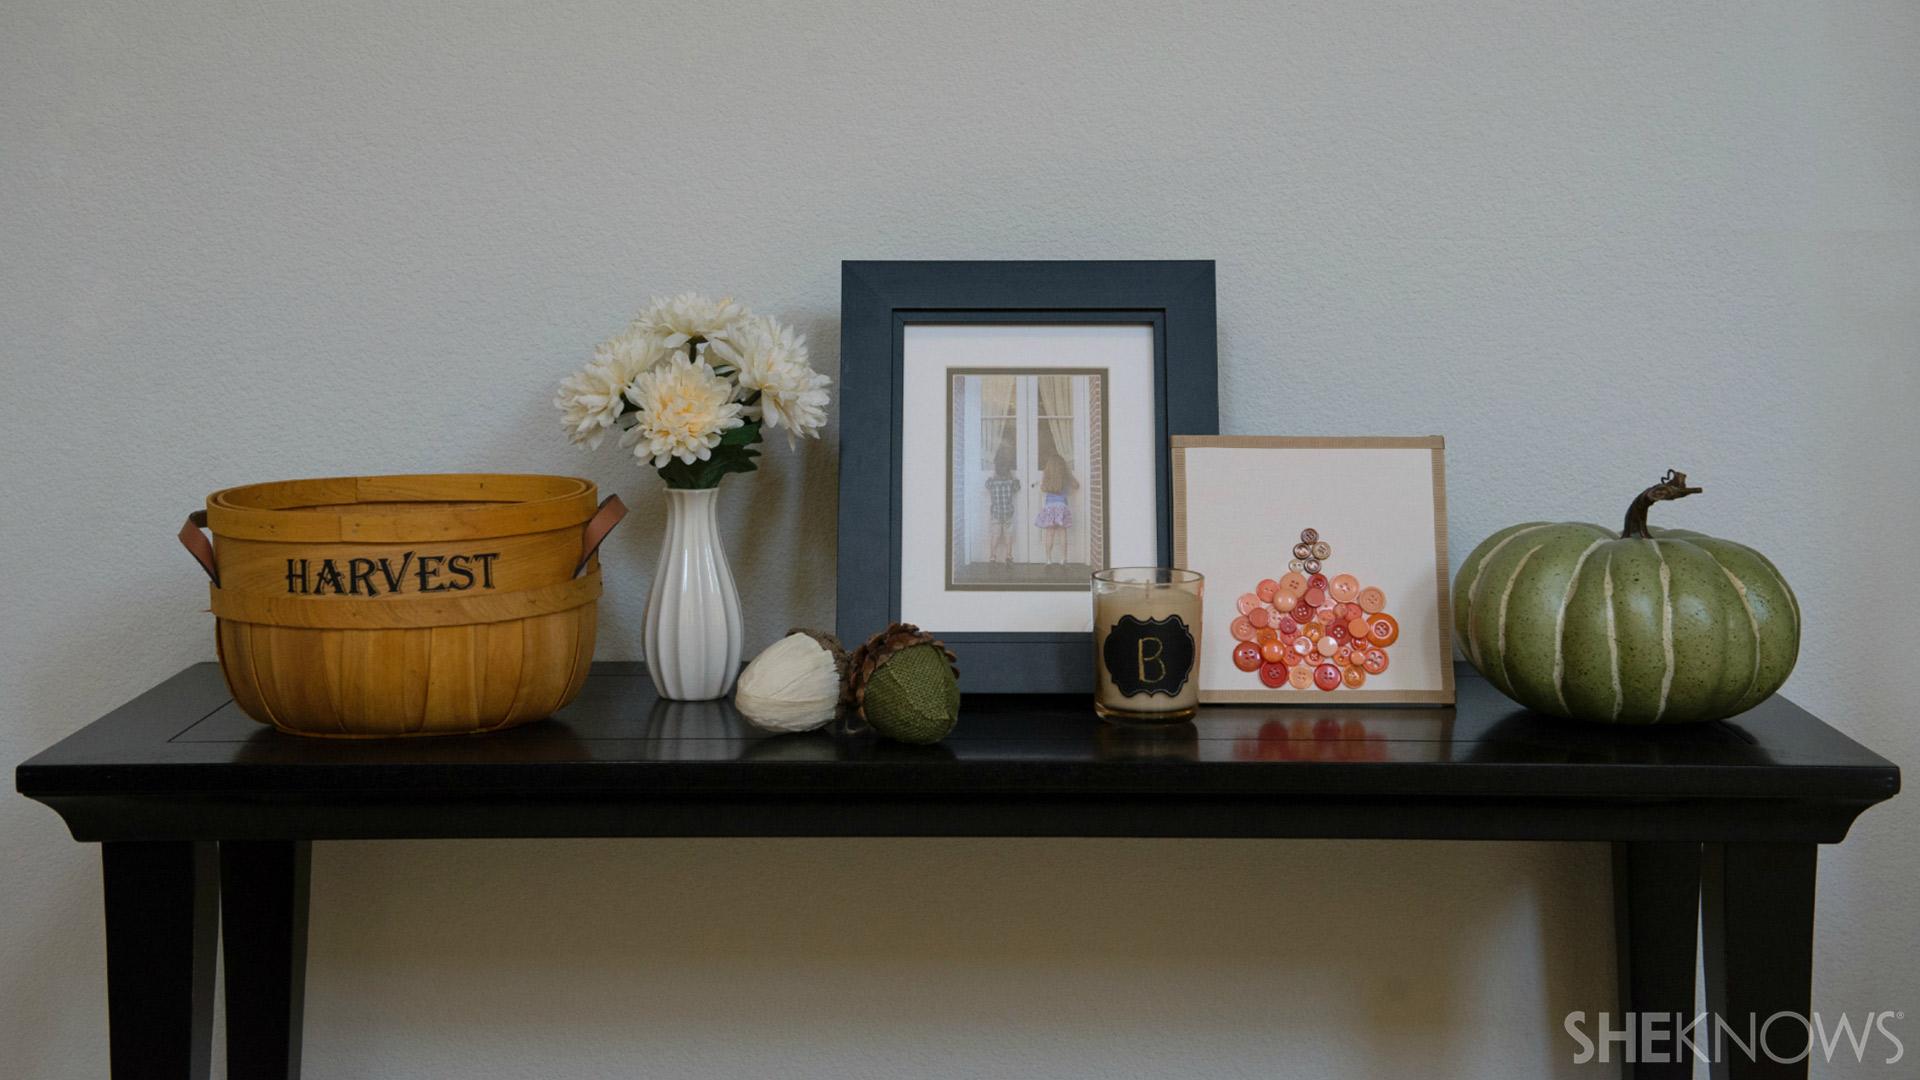 Button pumpkin | Sheknows.com - Final display